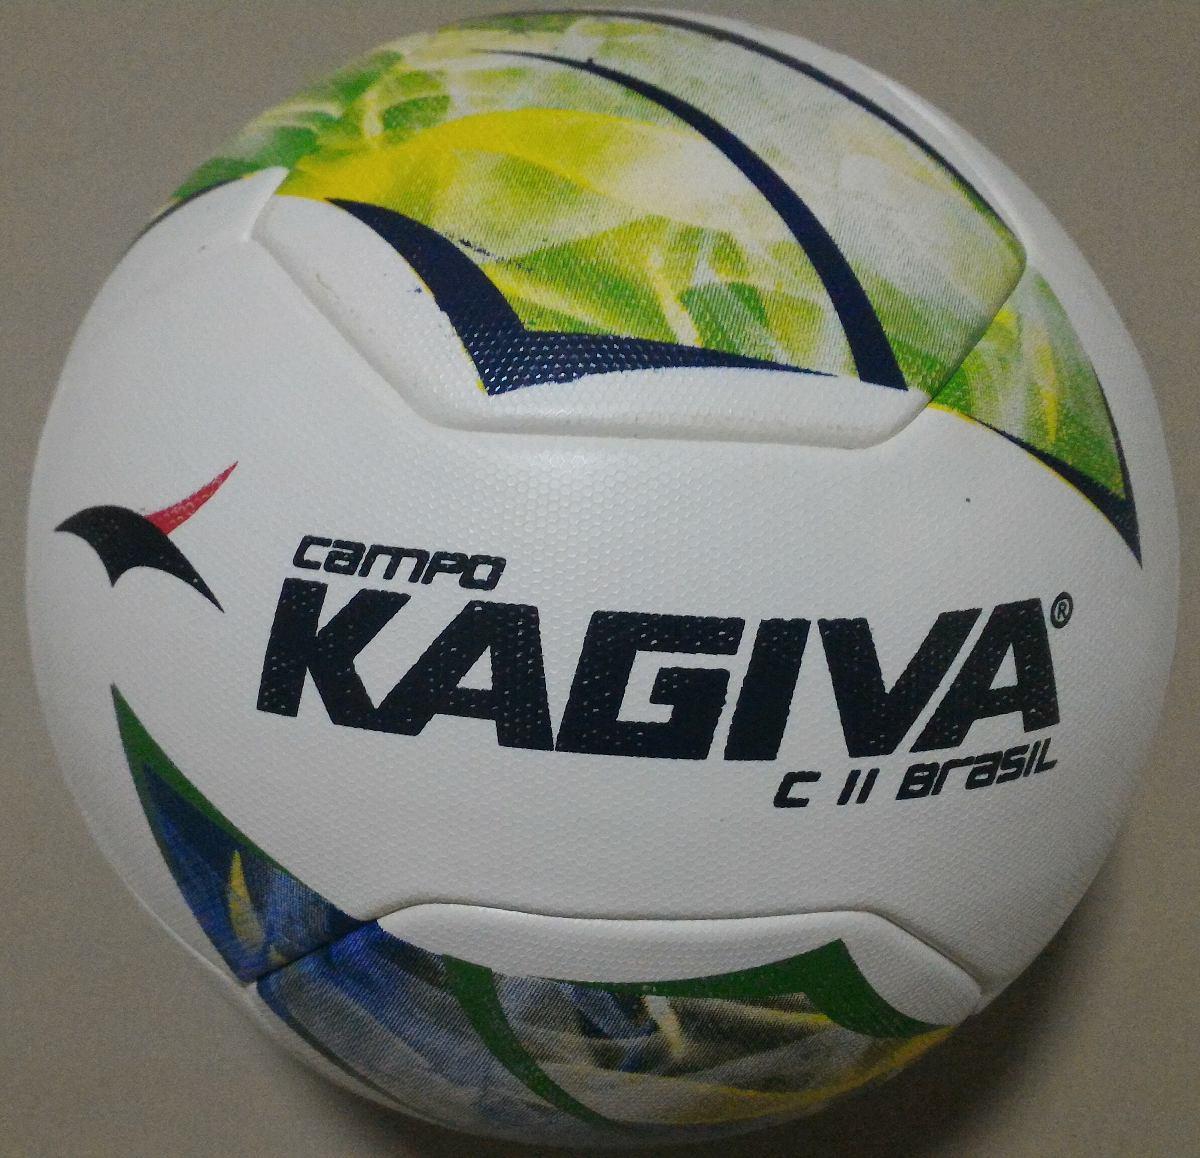 a0145332f8 Bola Futebol Campo Kagiva C11 Brasil - Revest. Em Pu - R  122